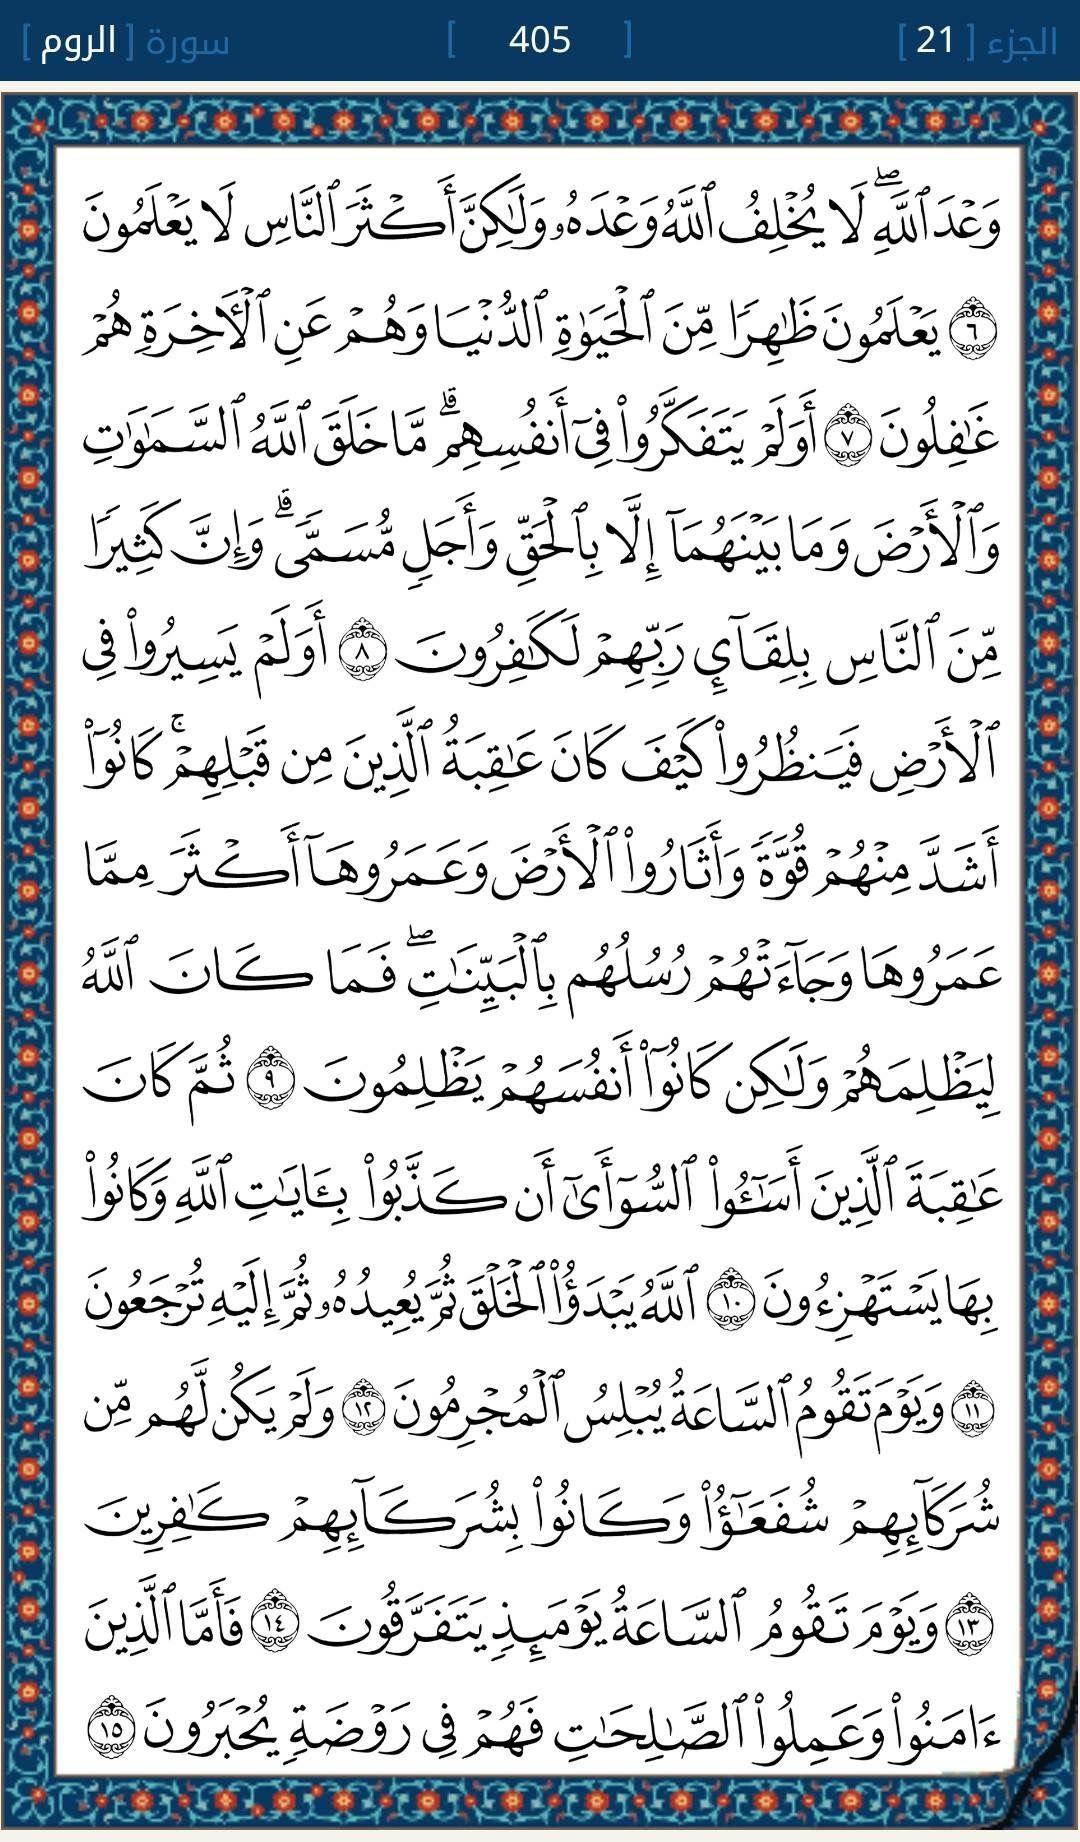 ٦ ١٥ الروم Quran Book Holy Quran Book Islamic Messages